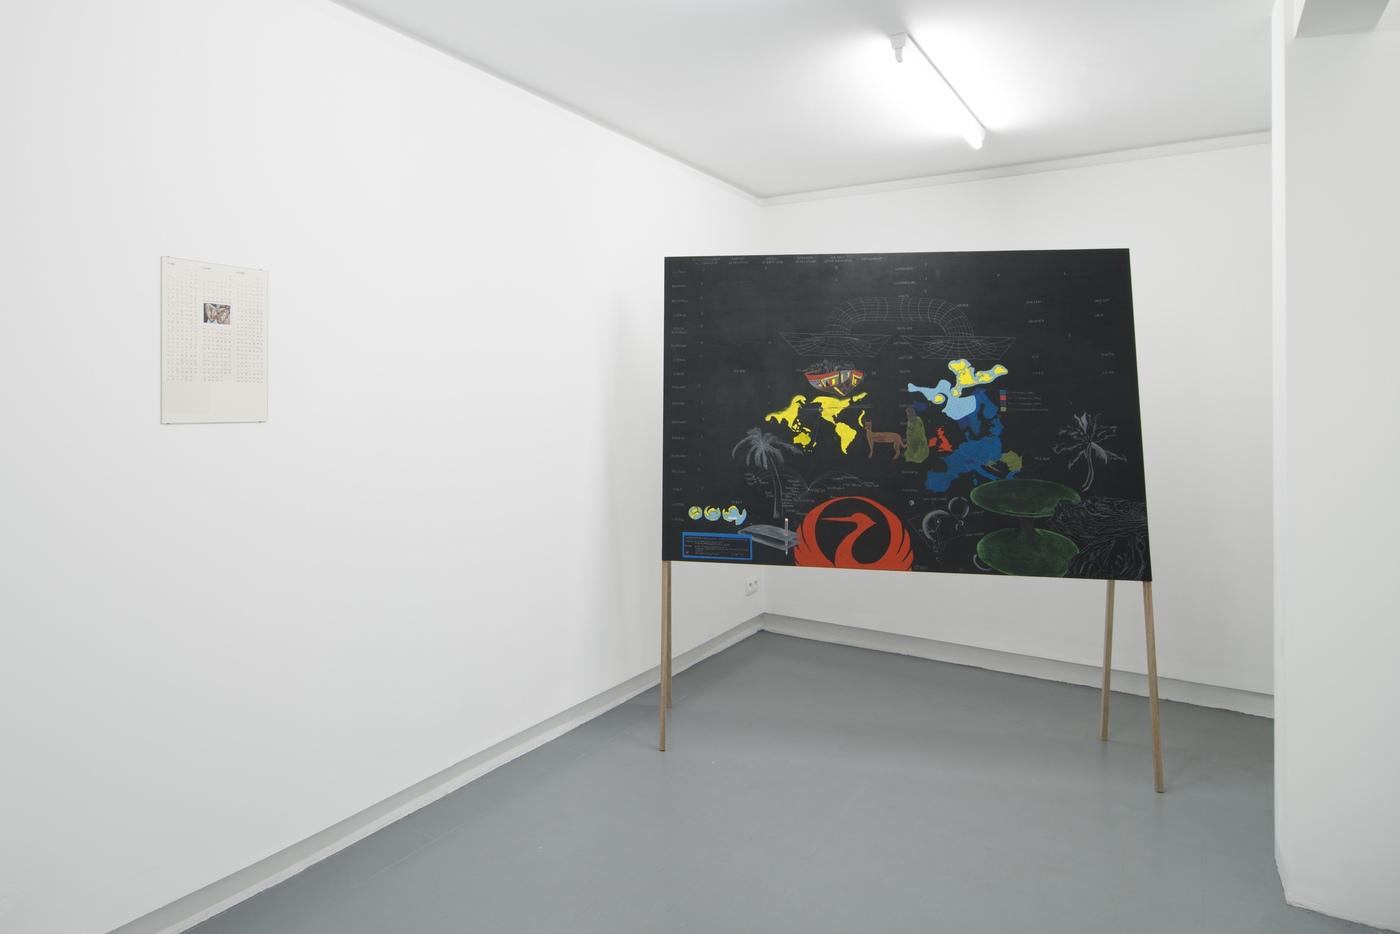 Raffaella Crispino_Tokyo-San Francisco_installation view 2